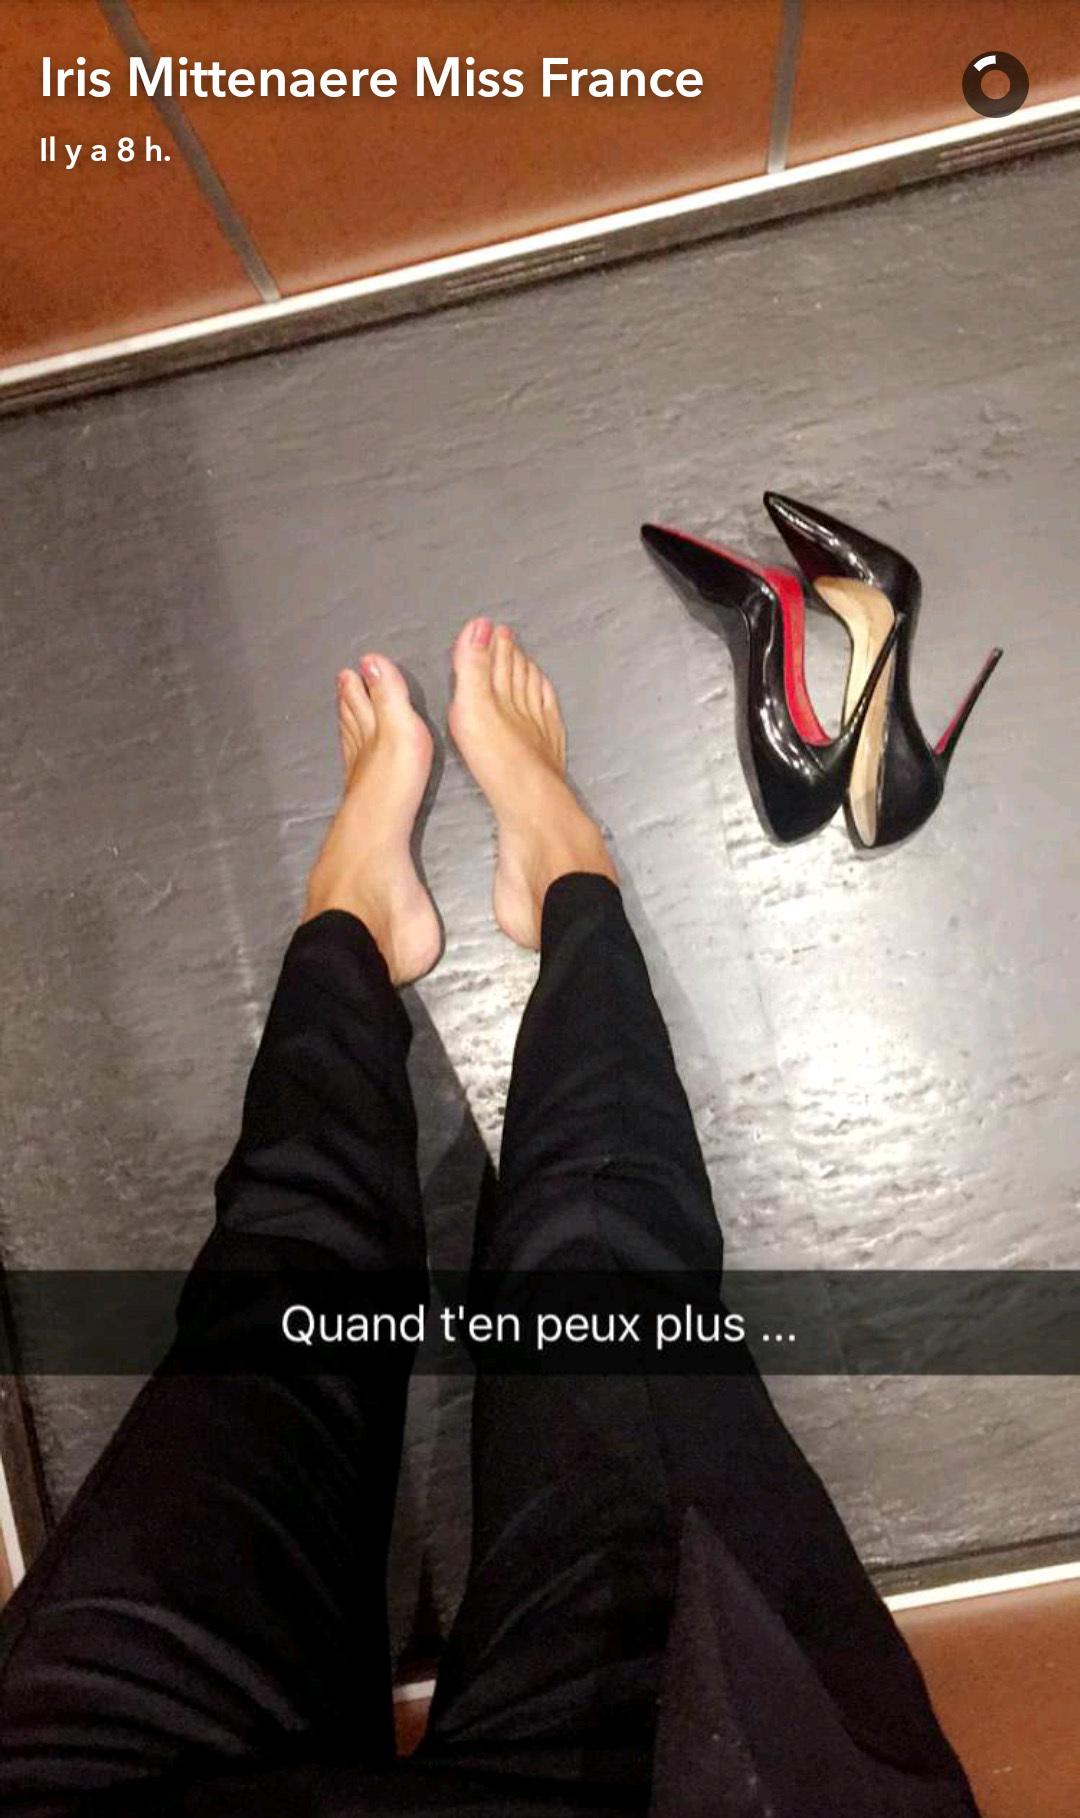 Feet Iris Mittenaere nudes (55 photos), Pussy, Bikini, Selfie, bra 2017